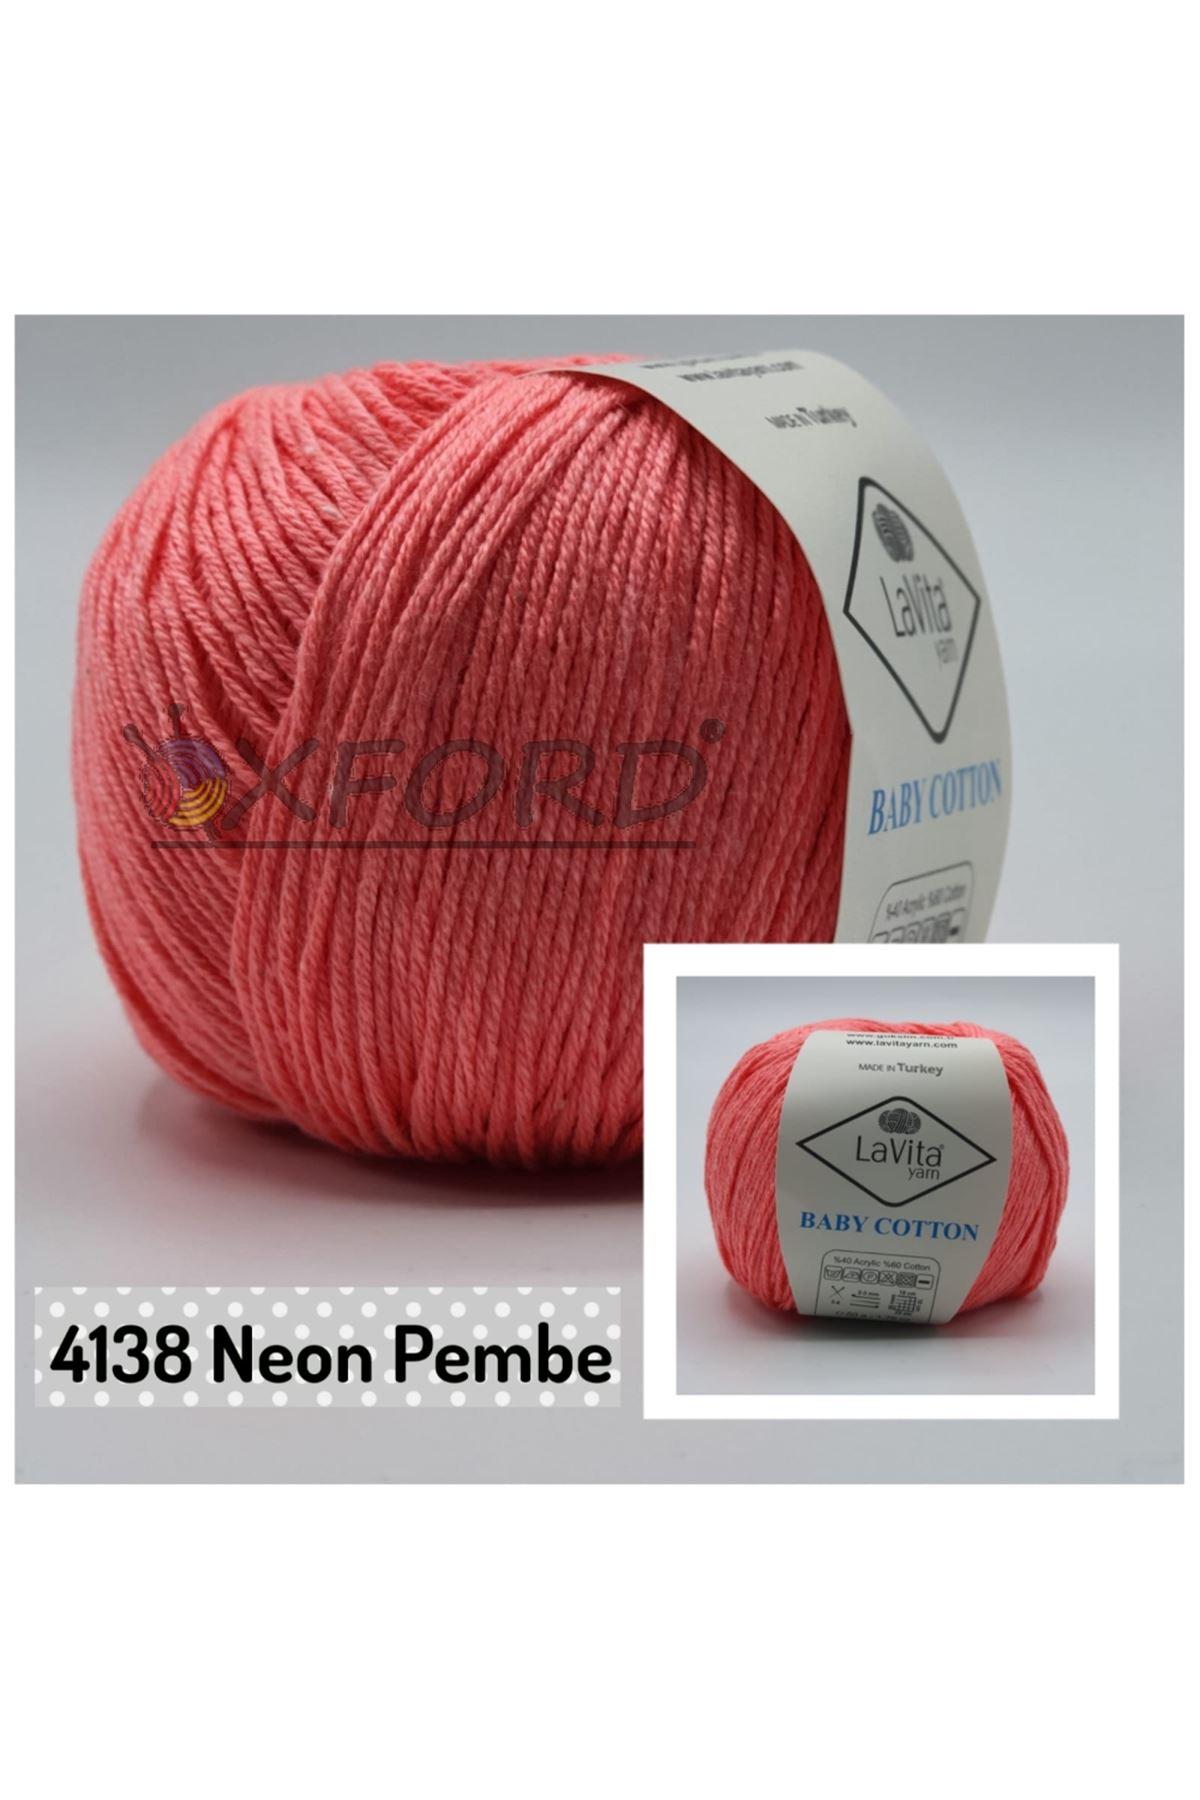 Lavita Baby Cotton 4138 Neon Pembe